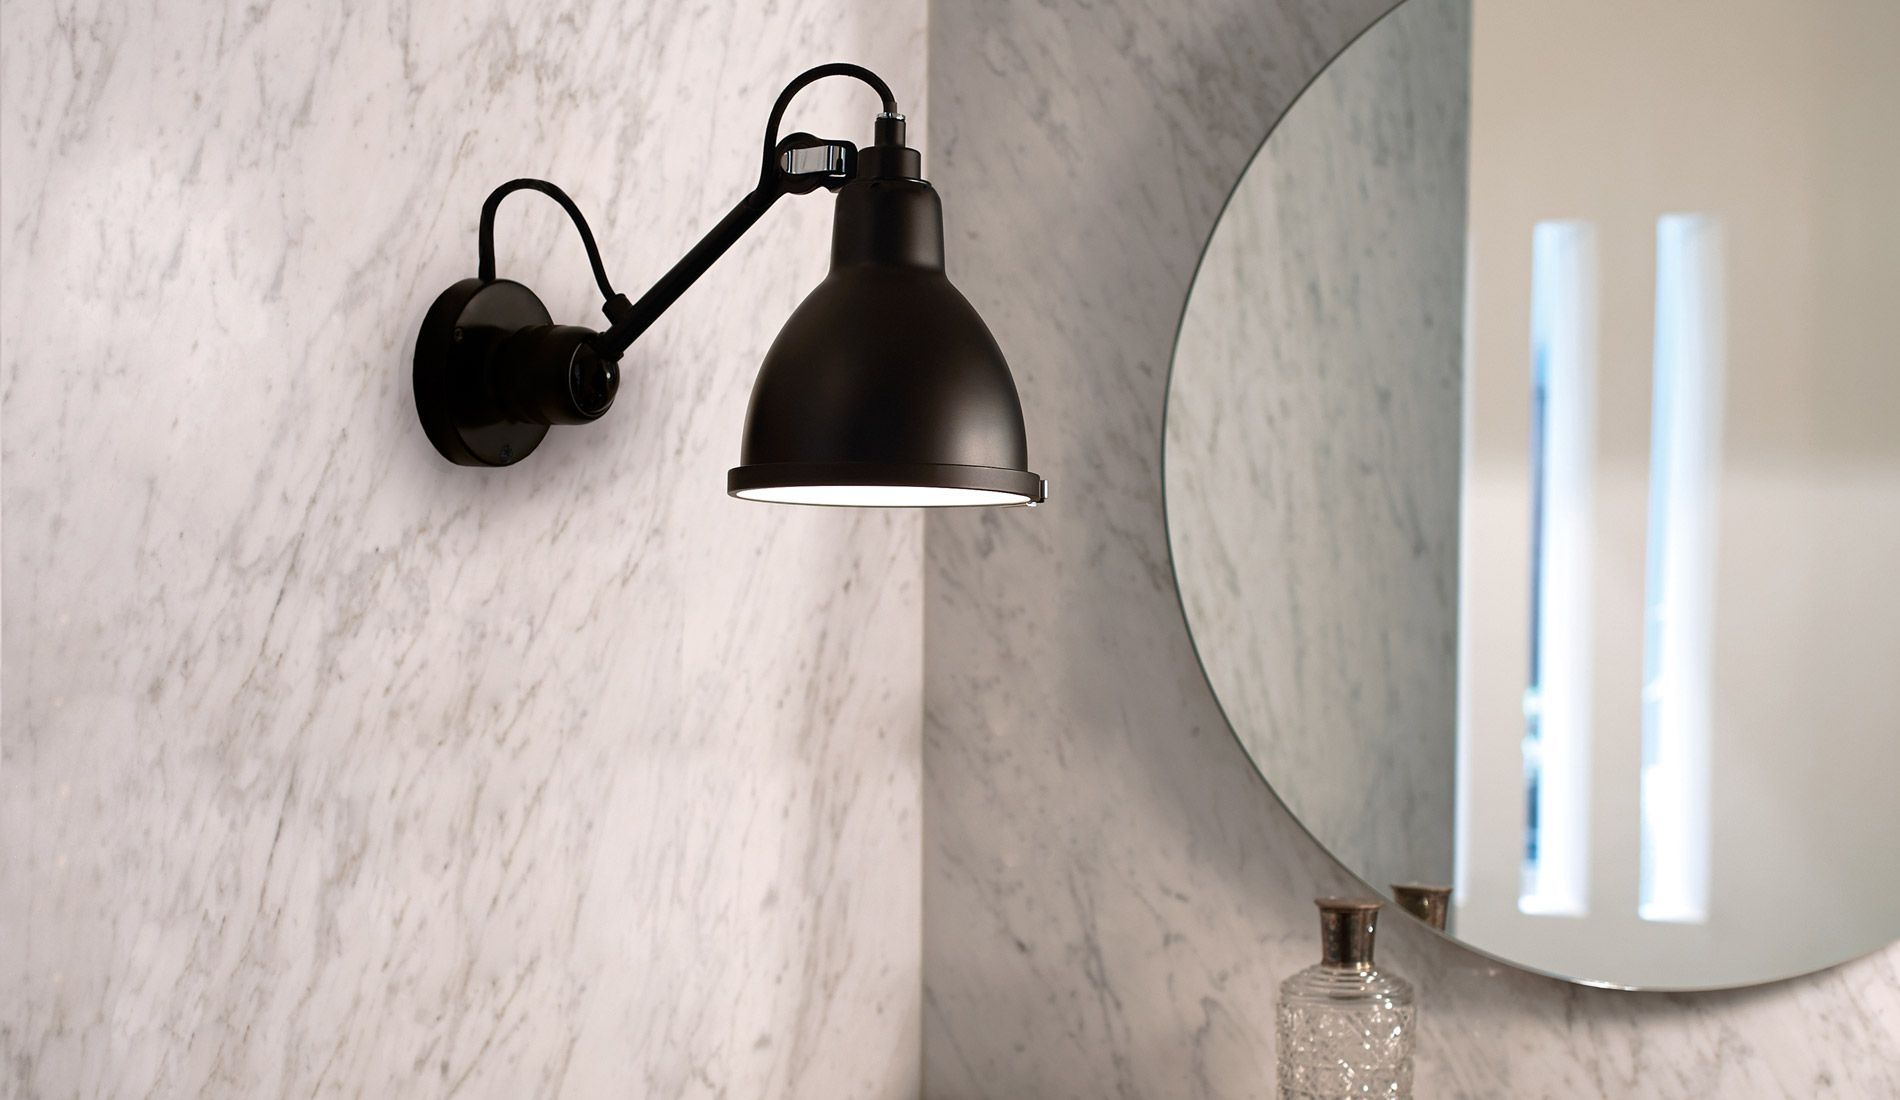 dcw lampe gras n°304 badezimmer wandleuchte  badezimmer